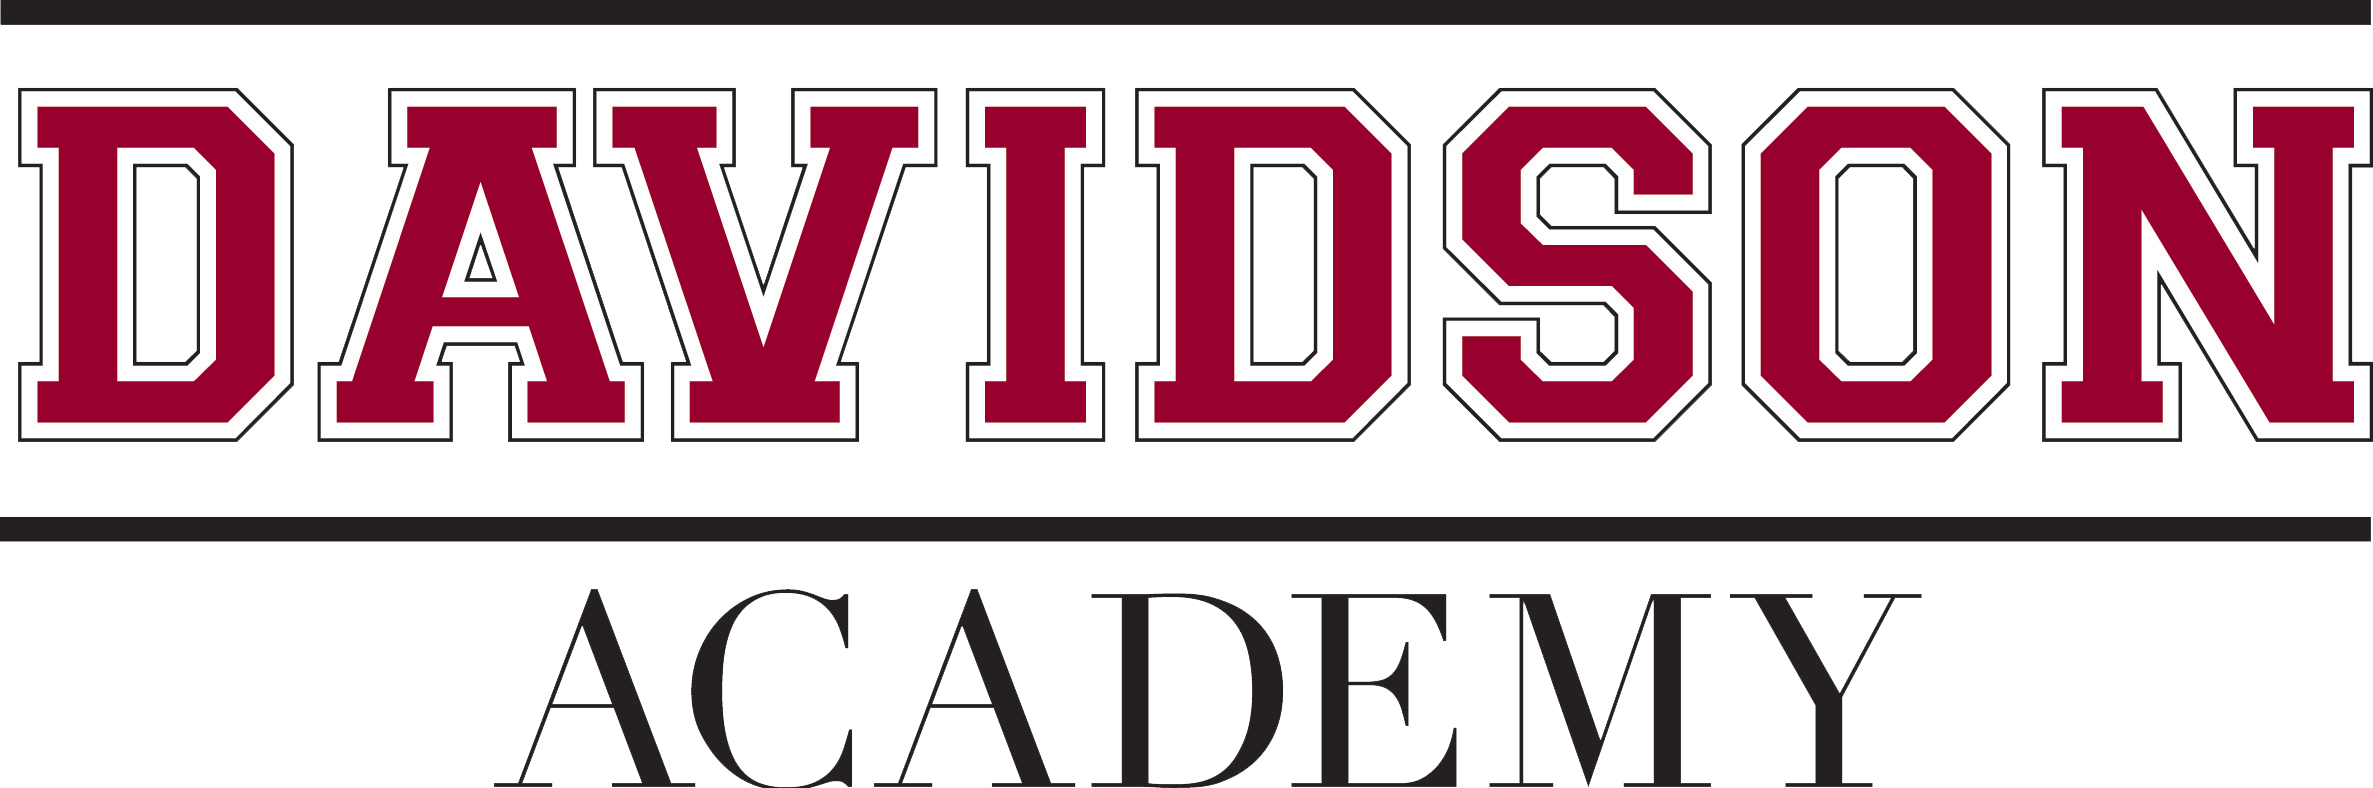 Davidson Academy   College Preparatory School   Nashville, Tn Inside Nashville Davidson County School Calendar